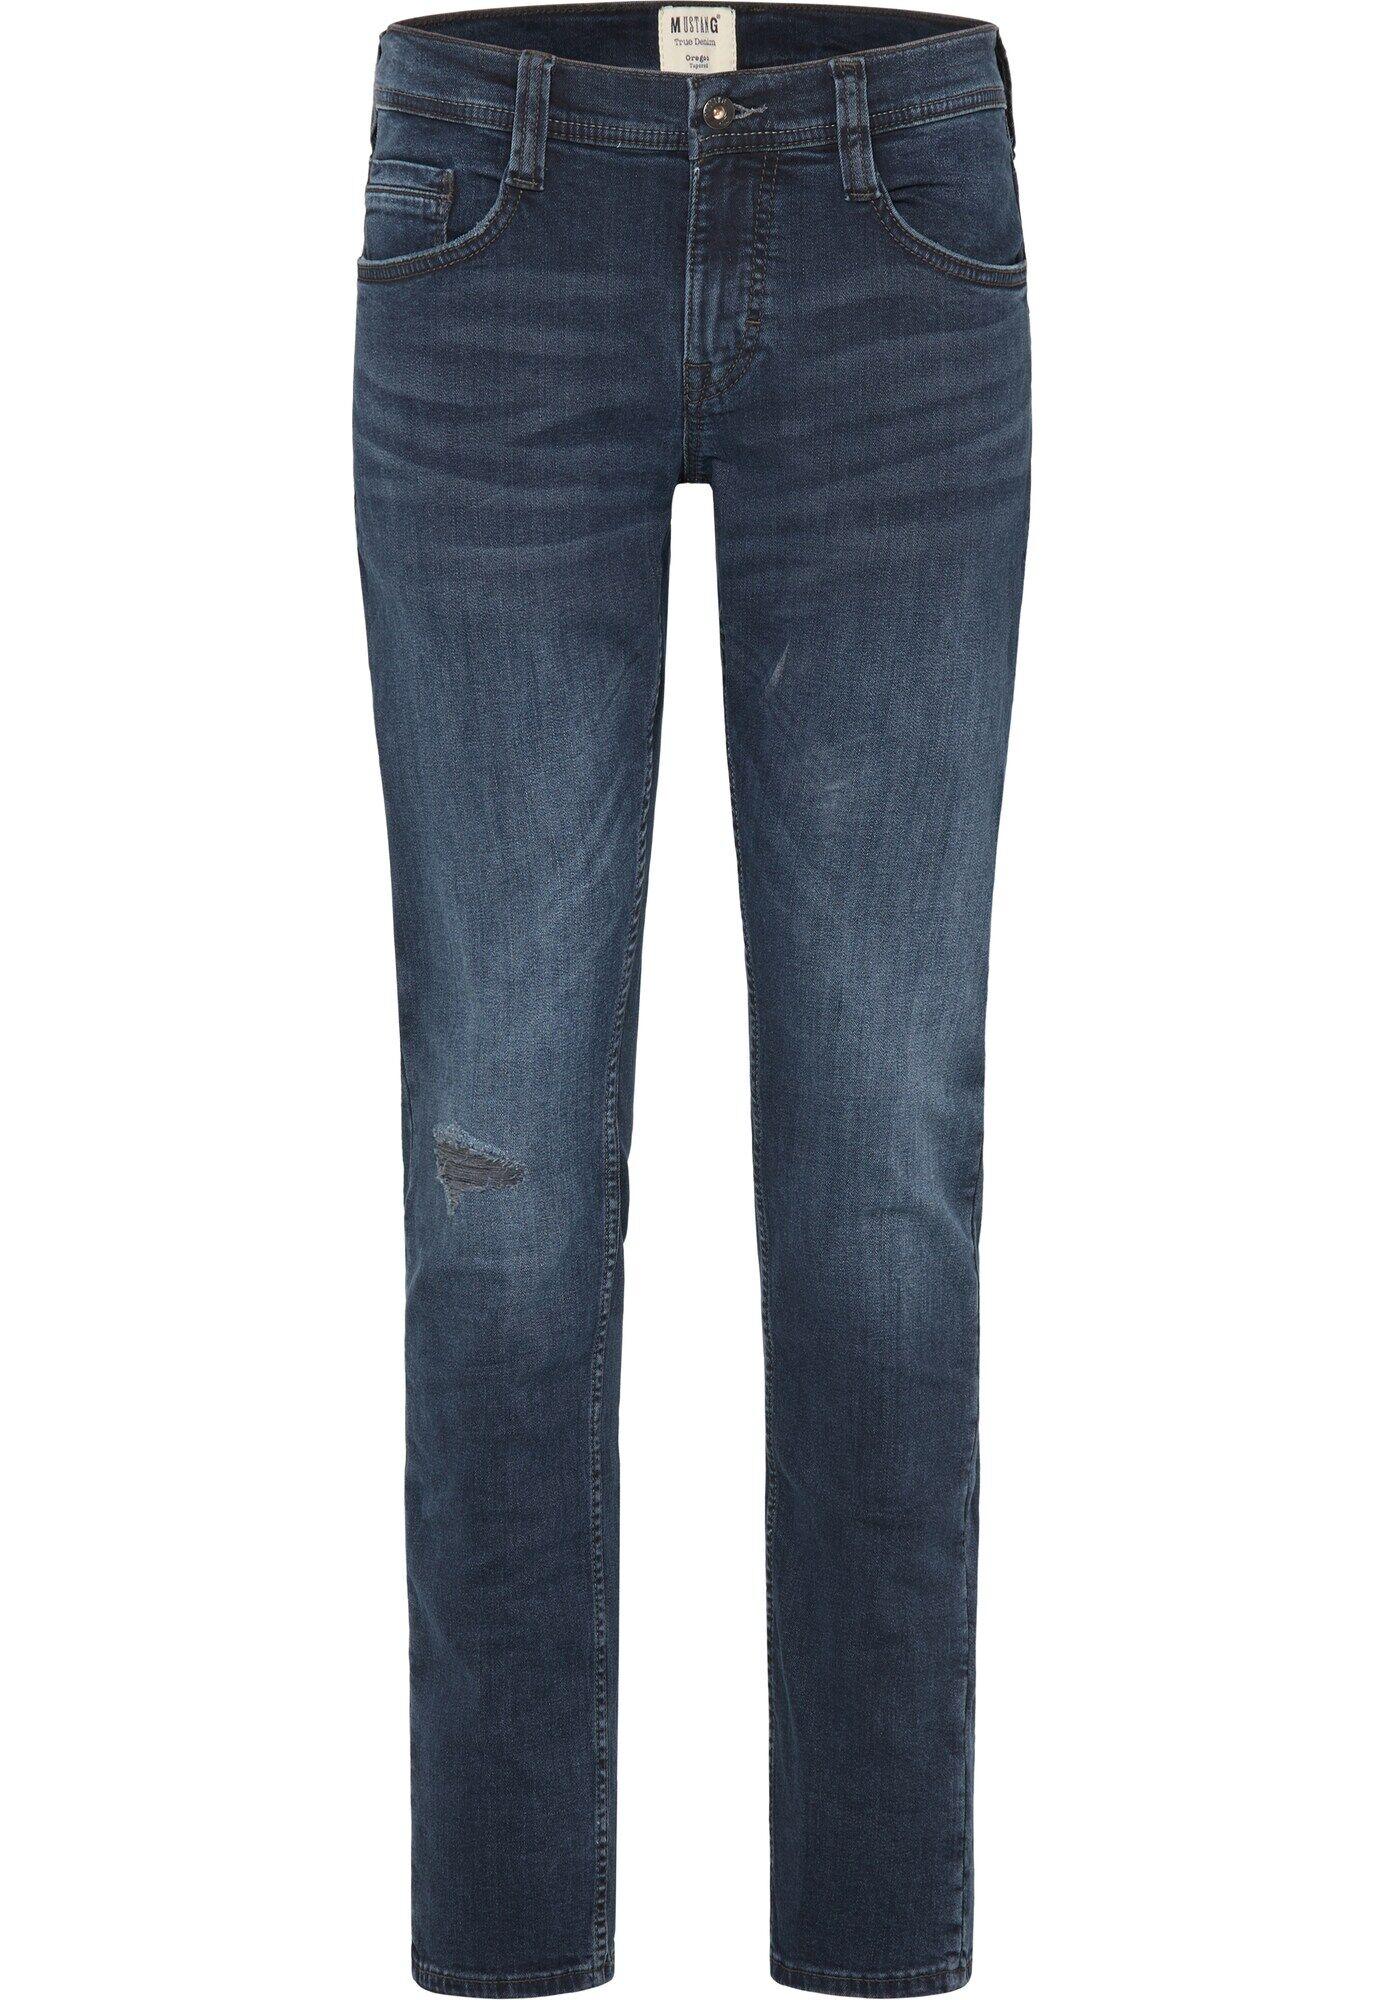 MUSTANG Jean 'Oregon'  - Bleu - Taille: 31 - male